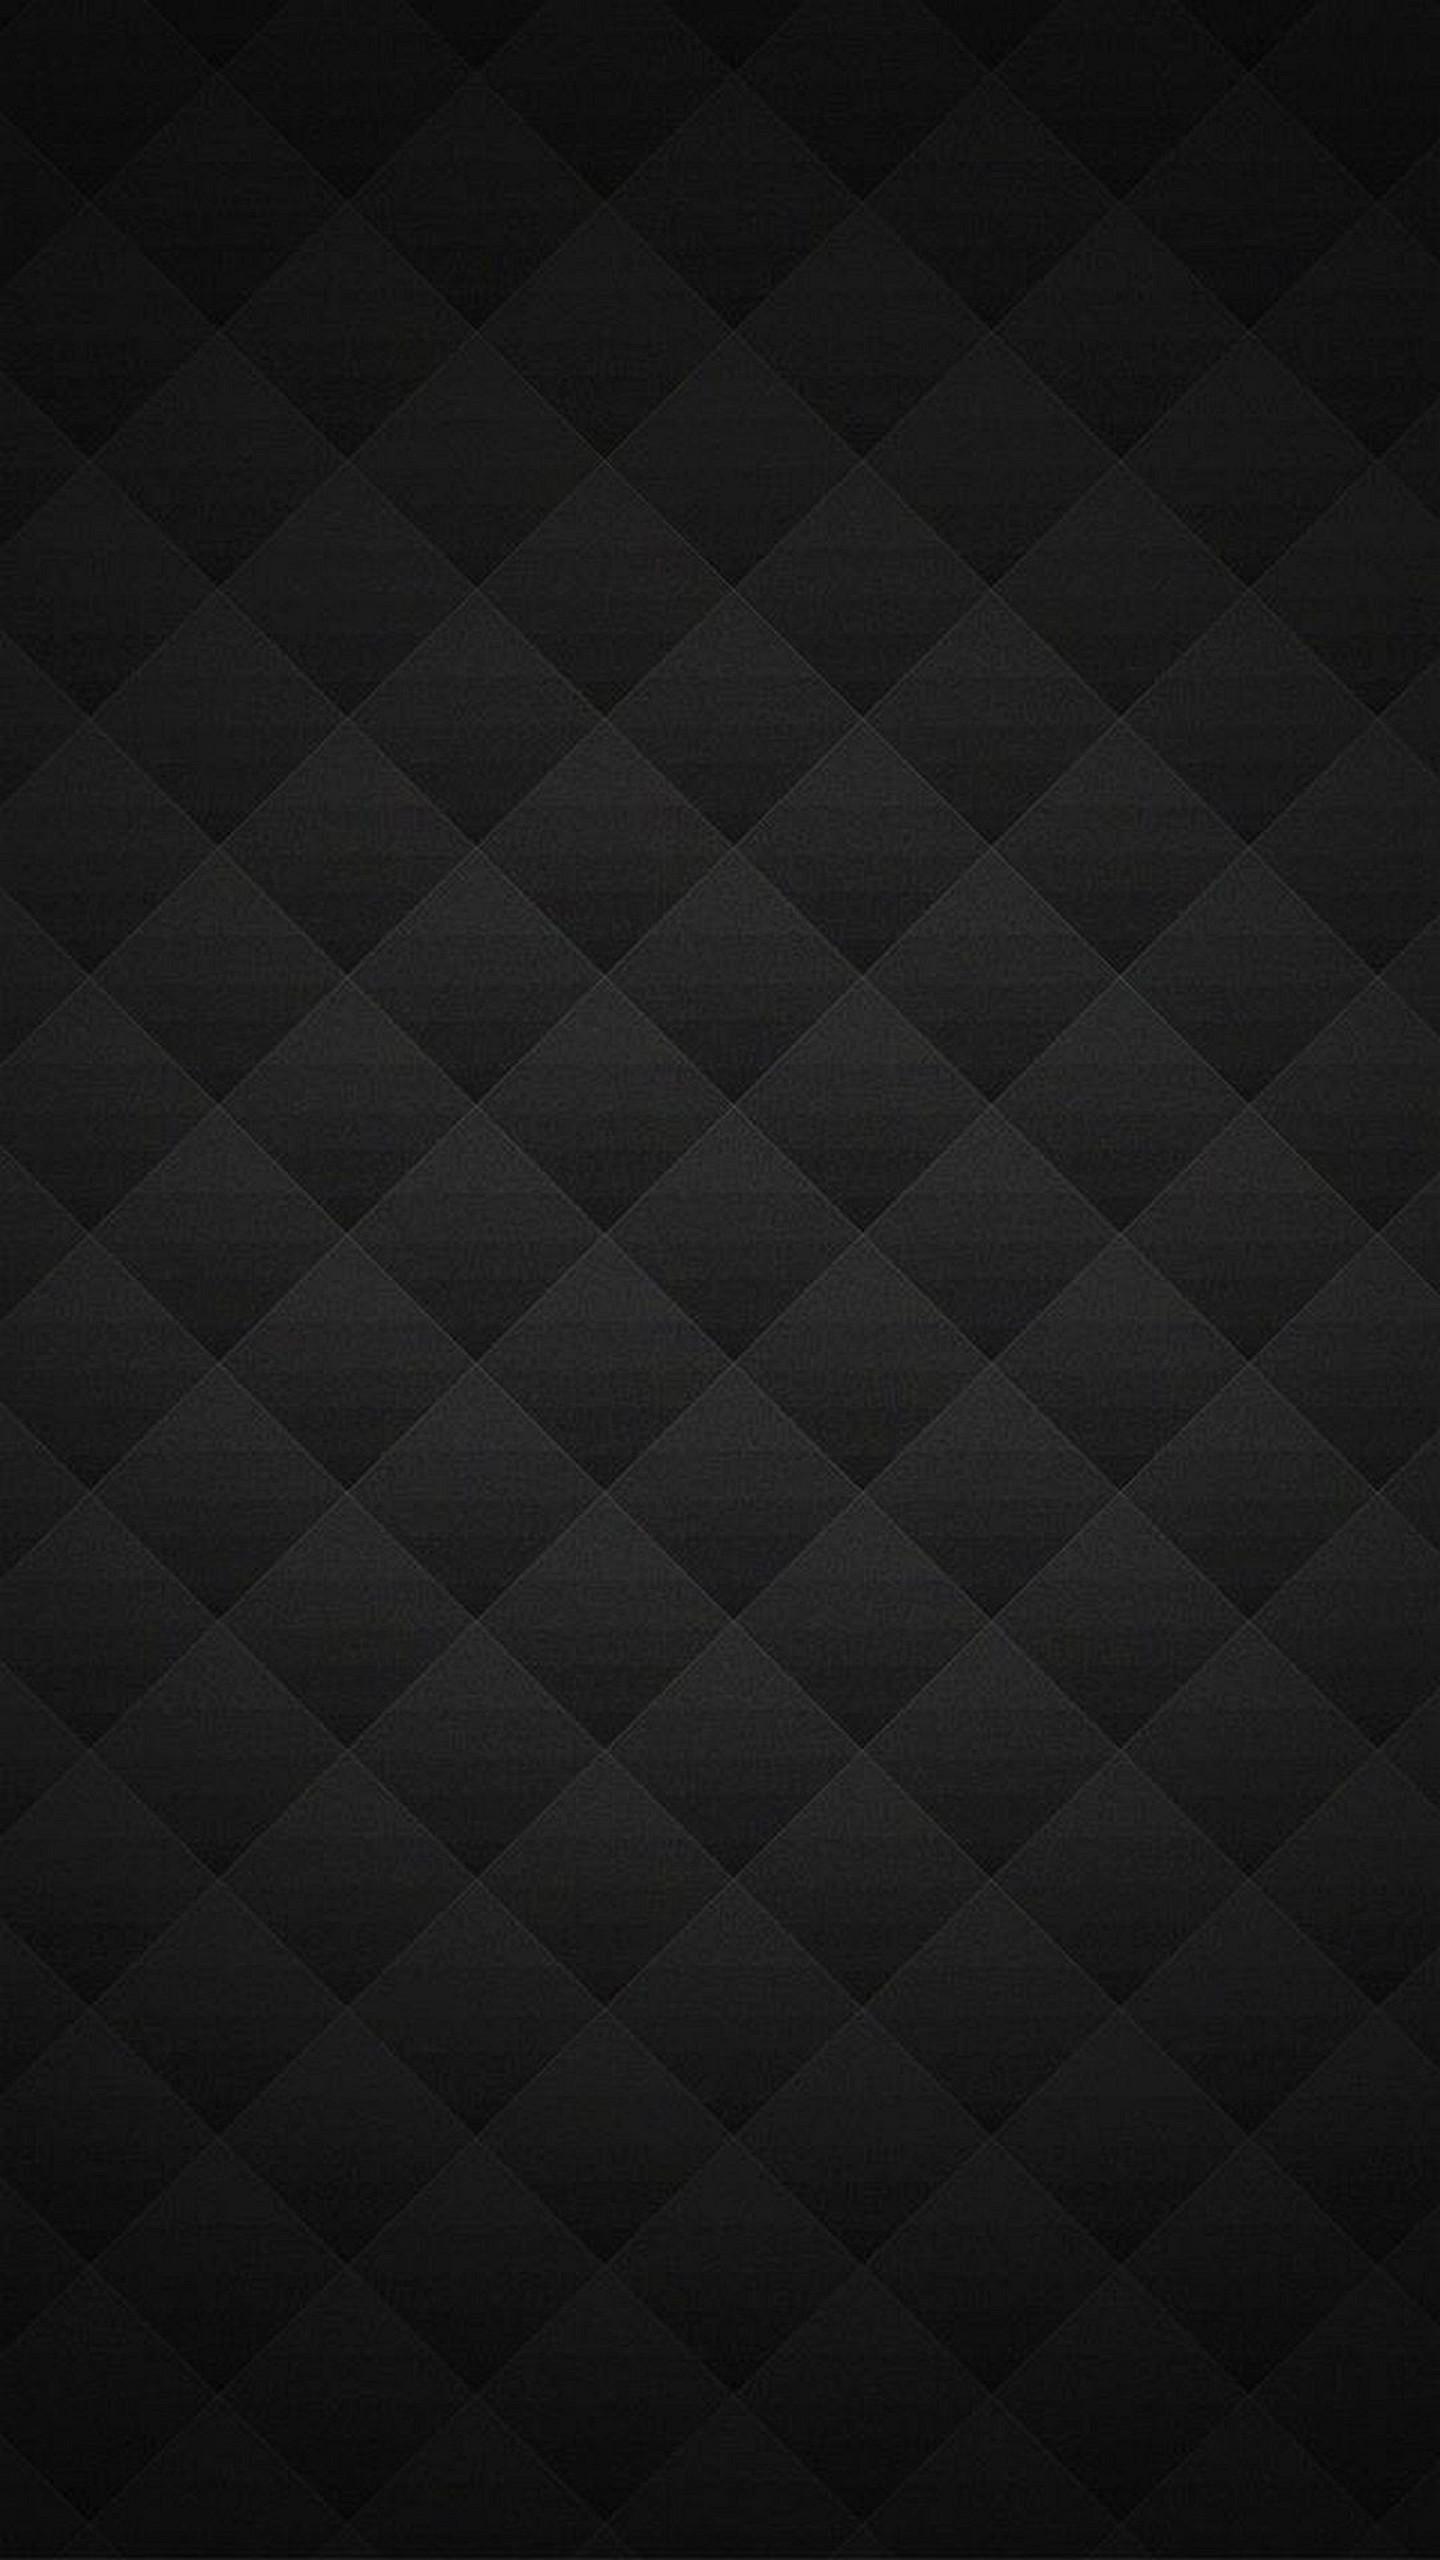 Wallpaper lg g3 1440 2560 91 1440x2560